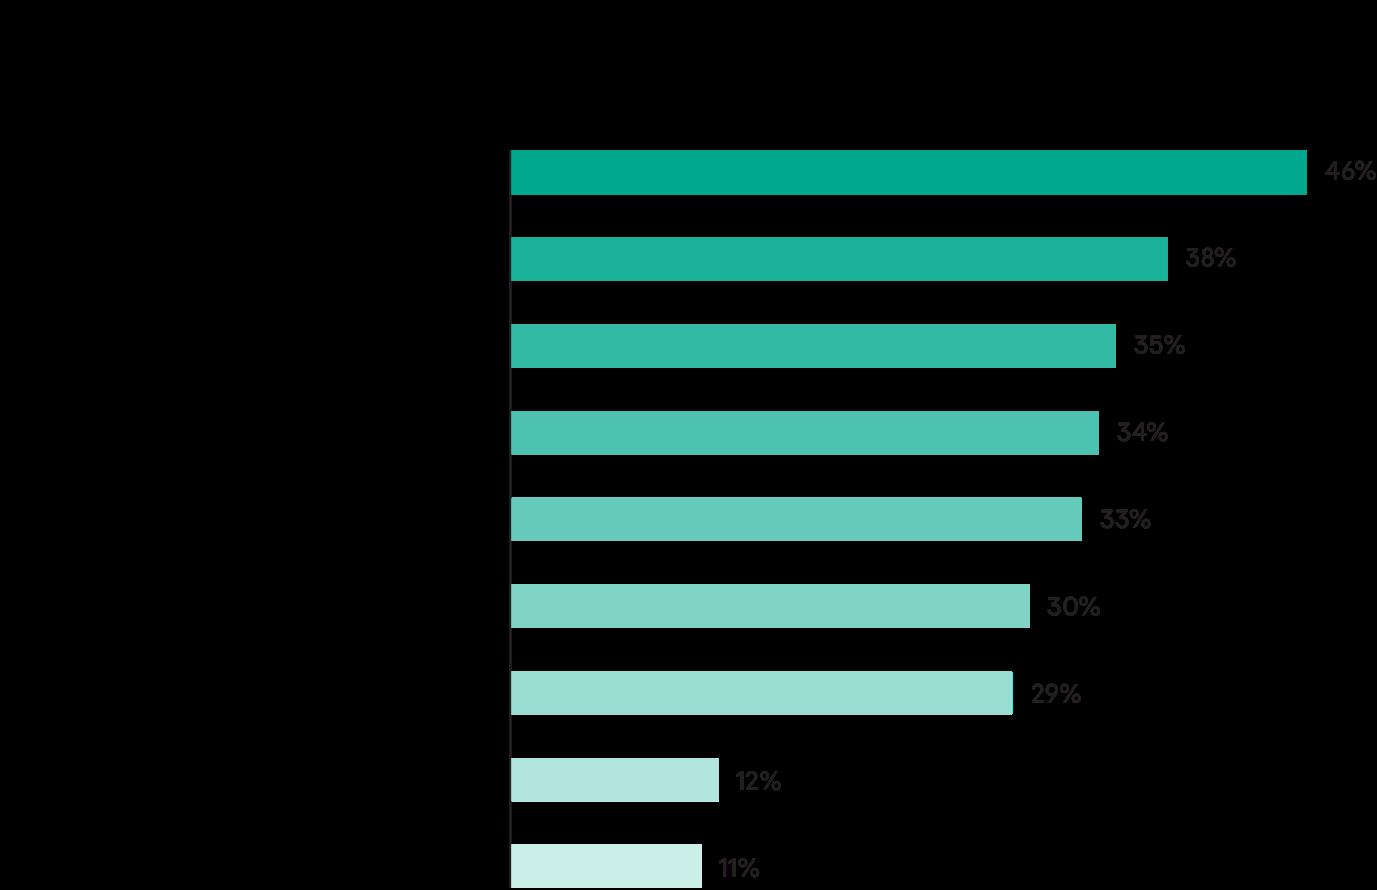 C:\Users\Miloslavskaya\Desktop\Anastasiya Miloslavskaya\Low budget hub\8089_IT_Security_small_budget_report\Graph_5-01.png